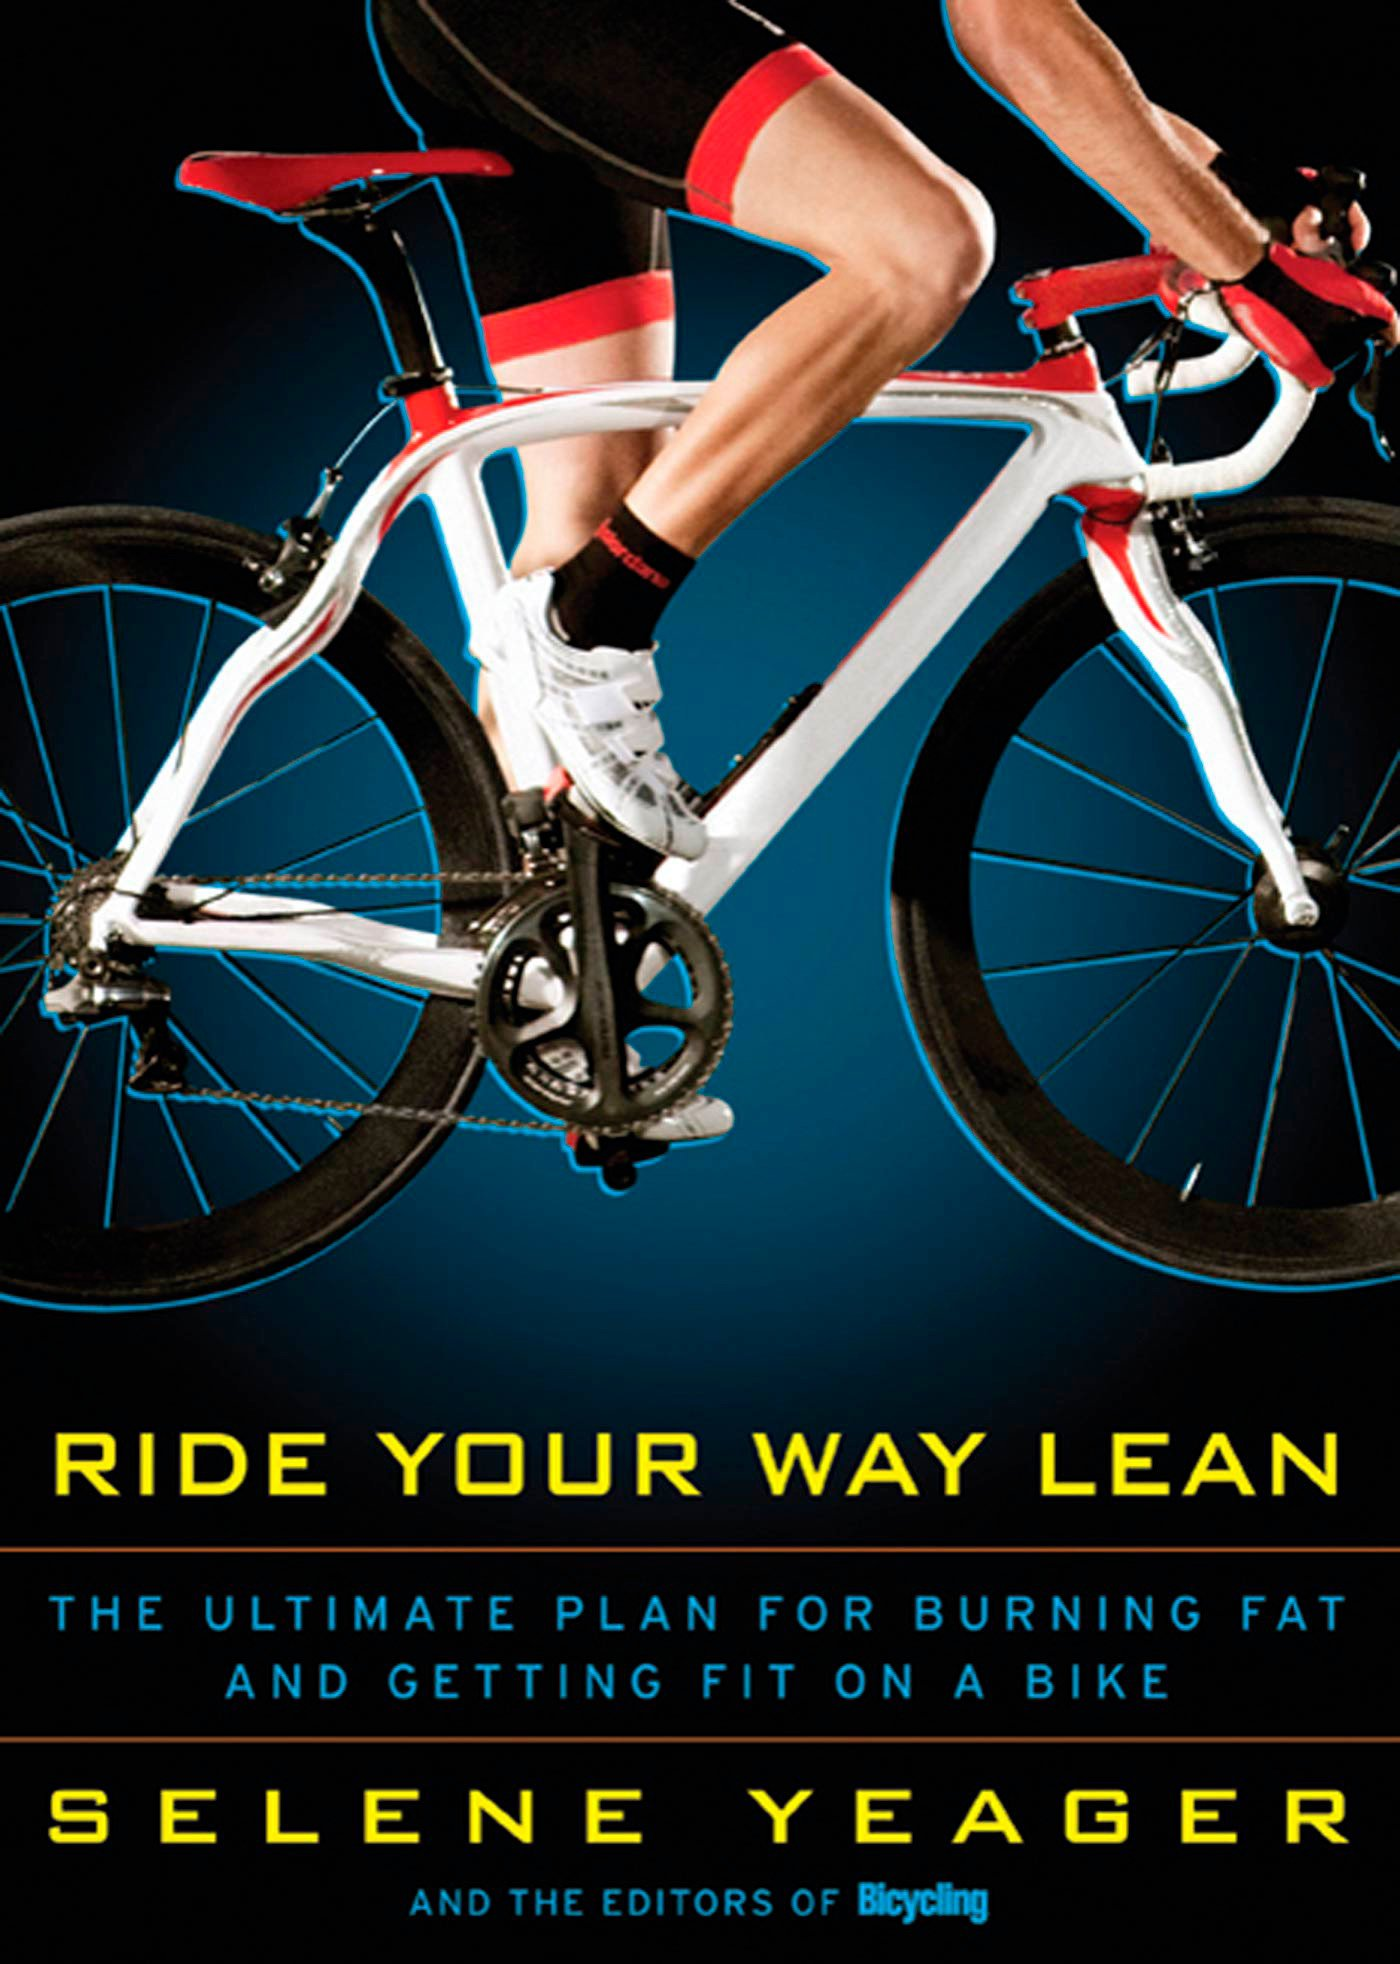 burn fat riding bicycle